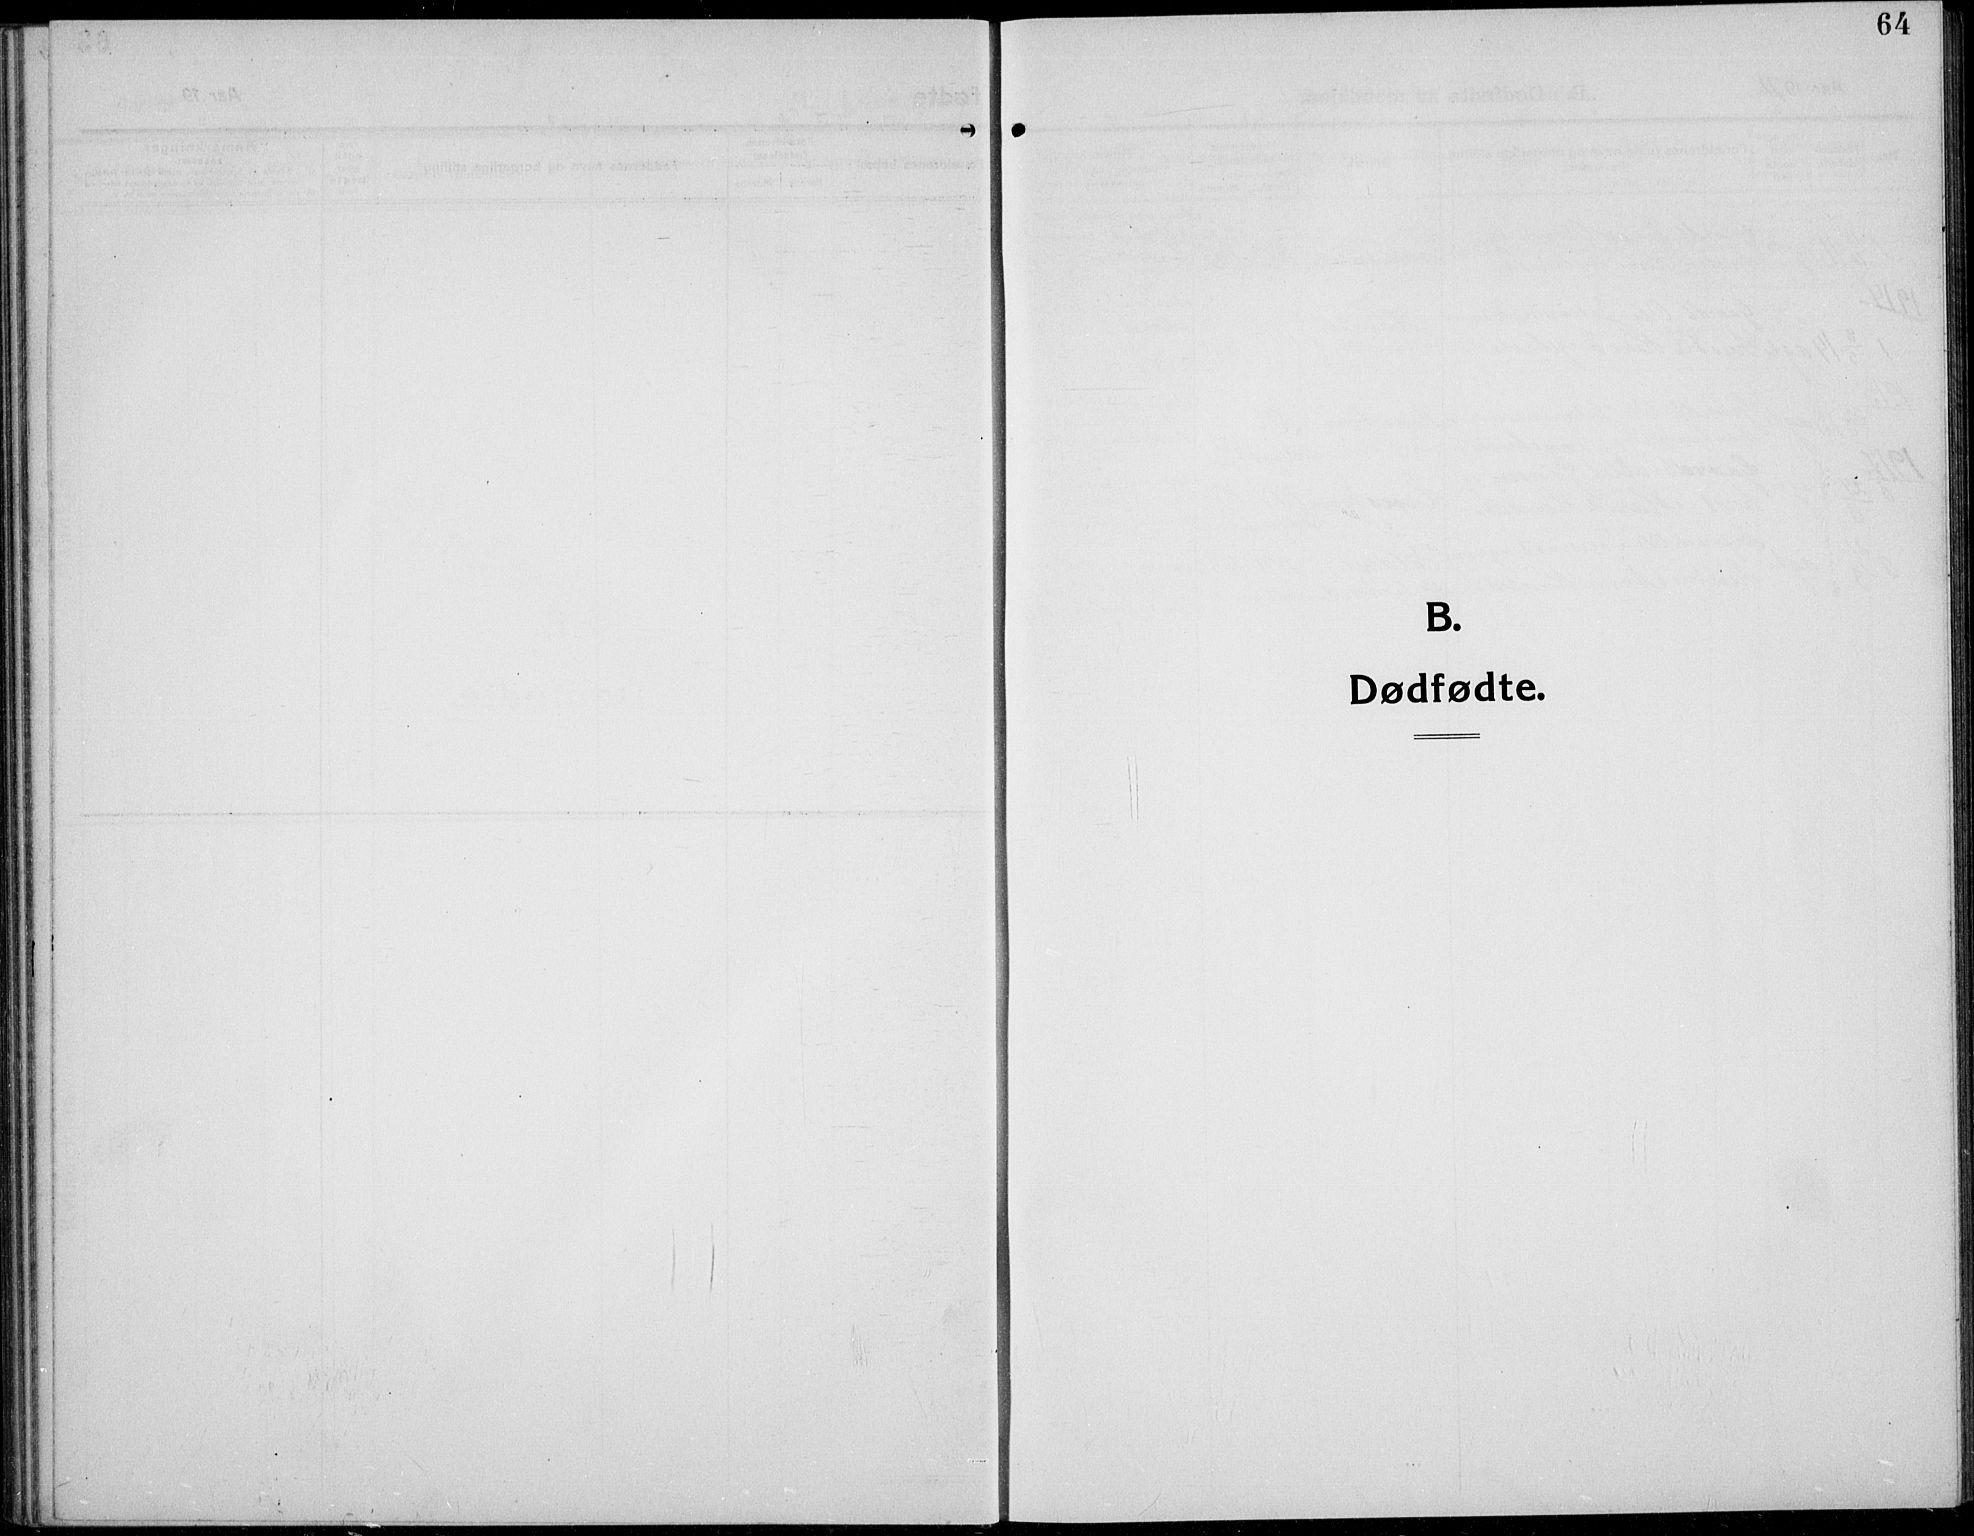 SAH, Øystre Slidre prestekontor, Klokkerbok nr. 8, 1911-1938, s. 64